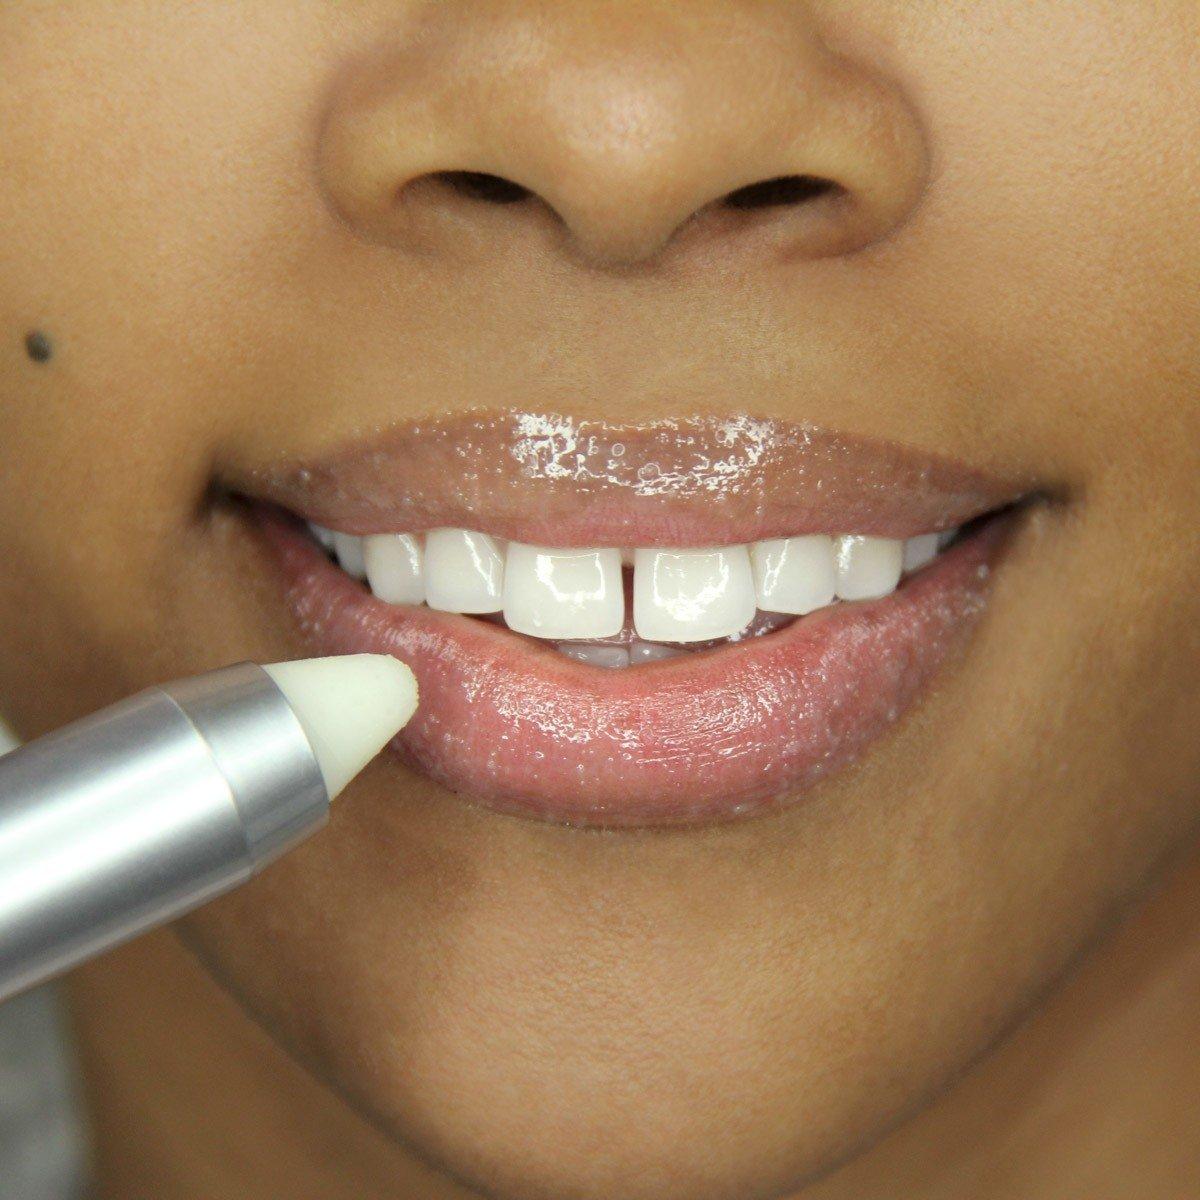 Plumping Lip Exfoliator by pür #6